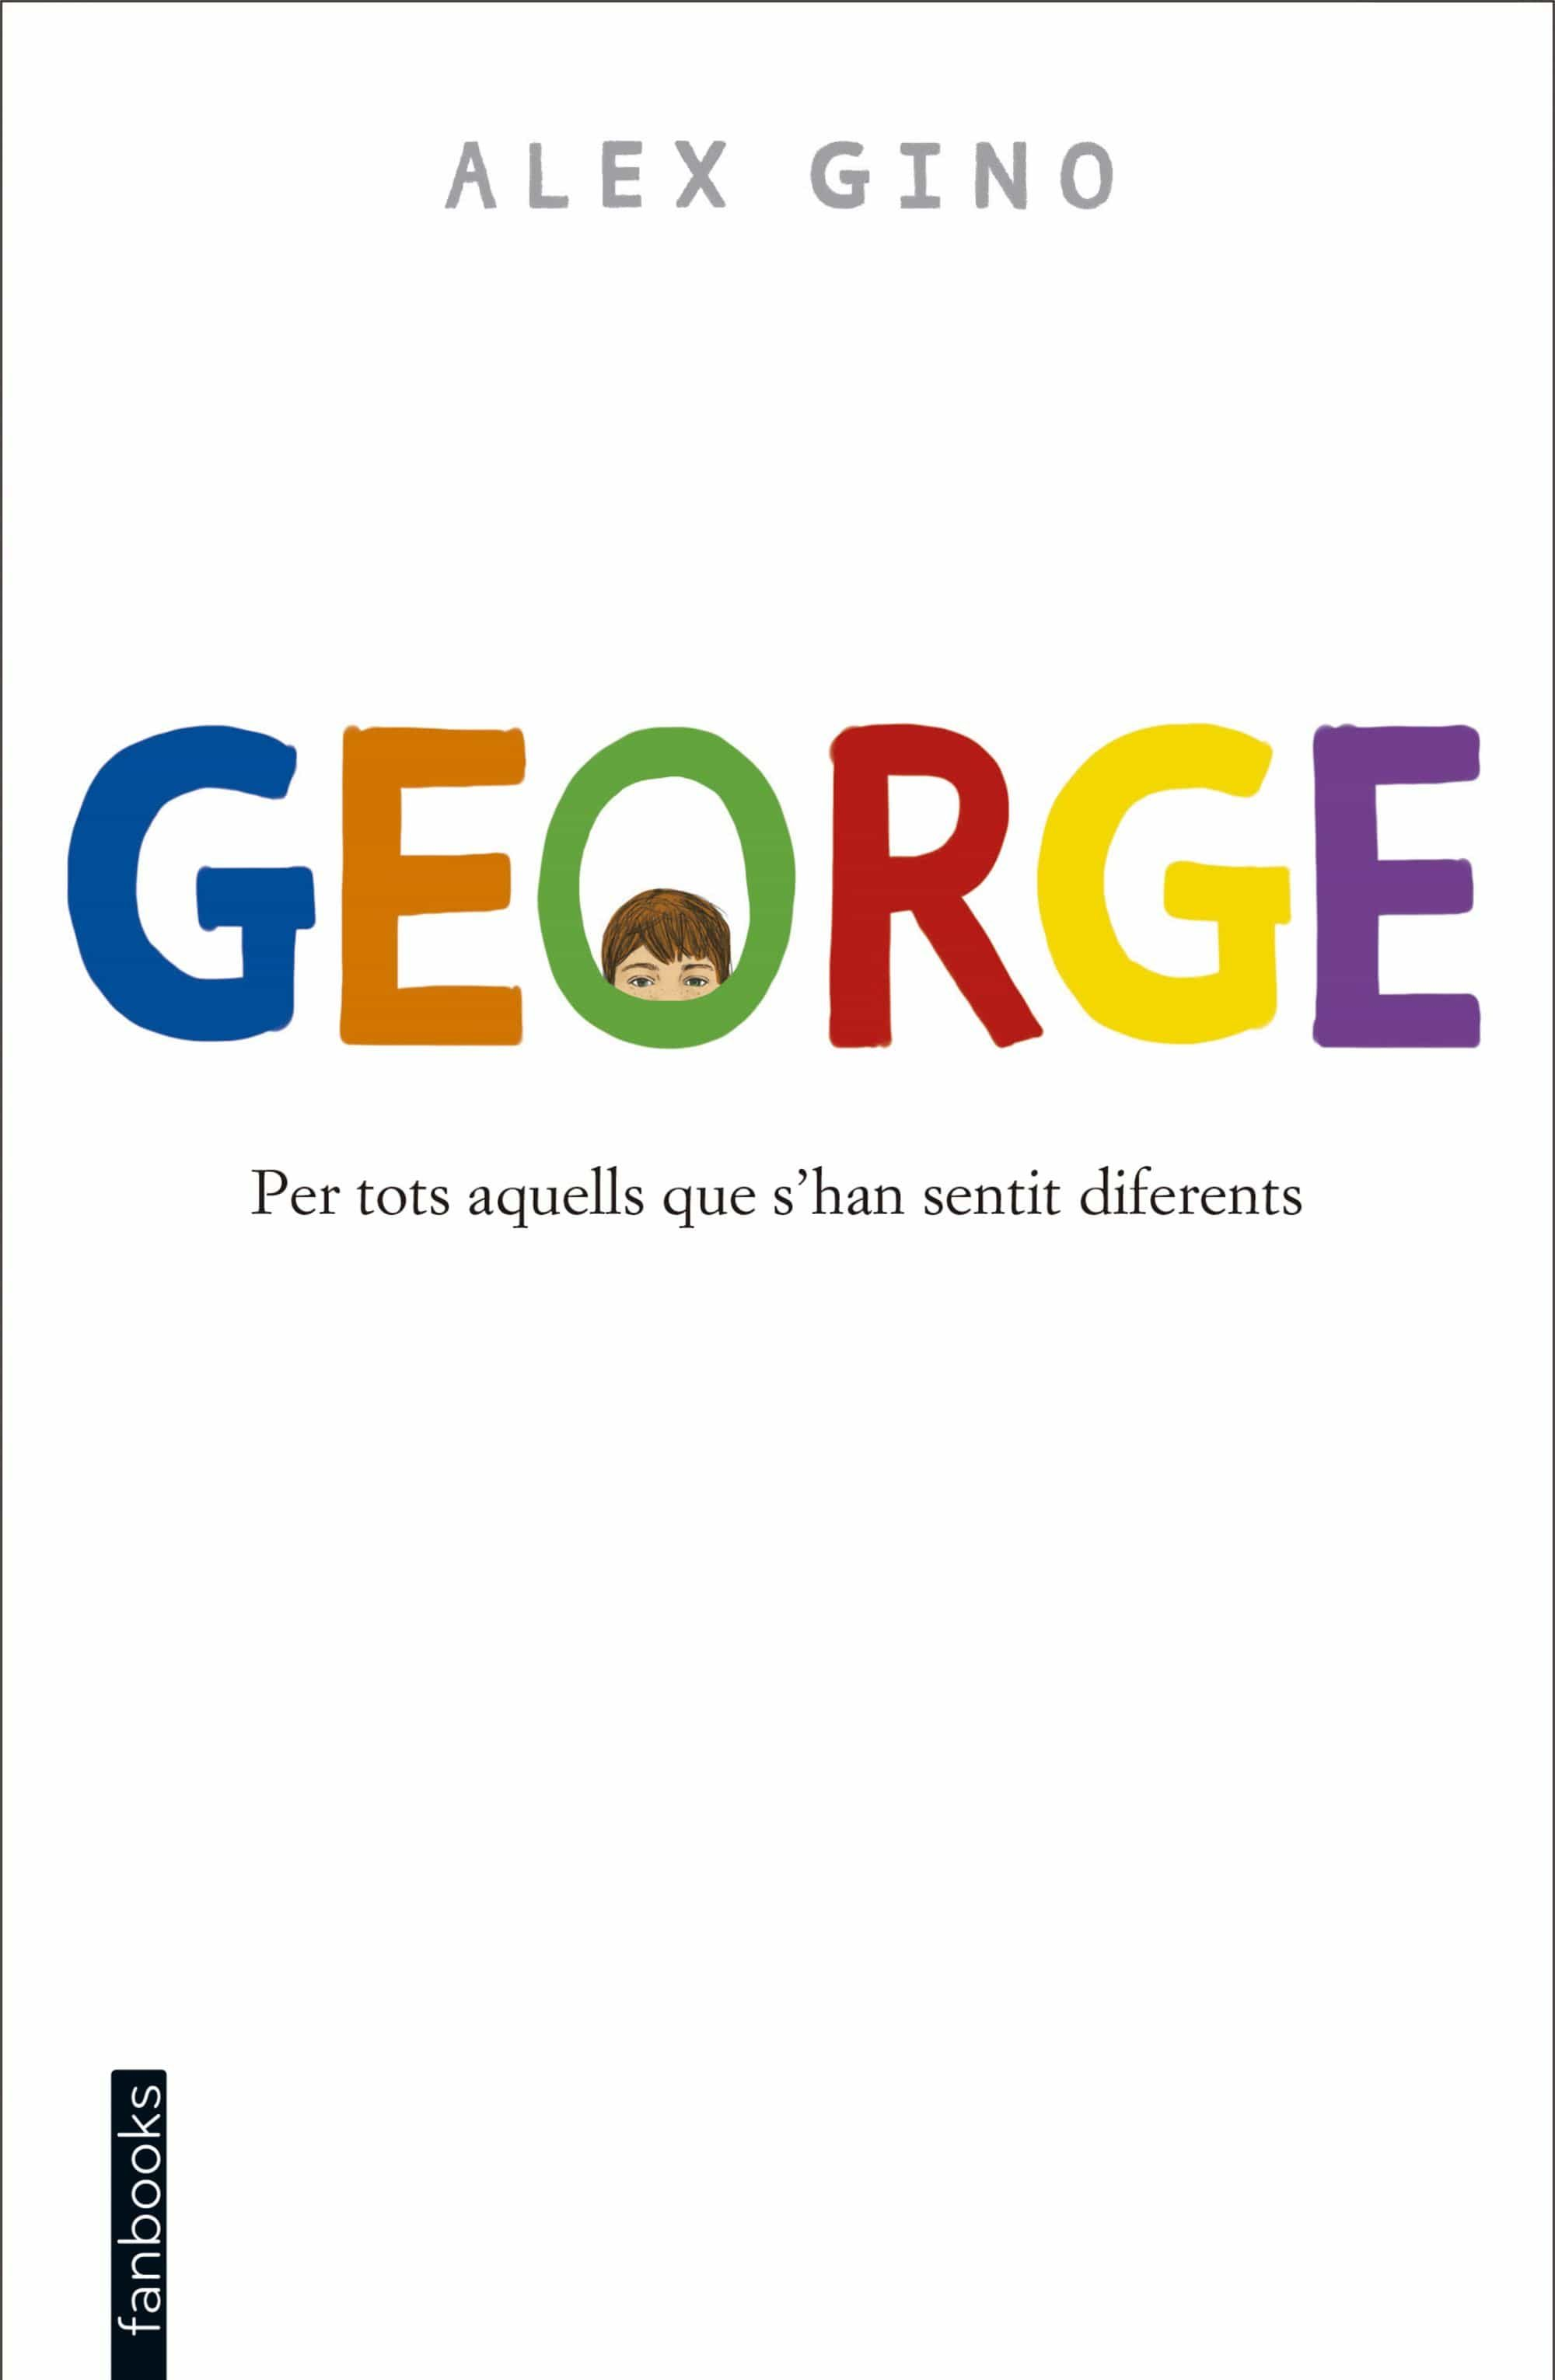 george-alex gino-9788416297580